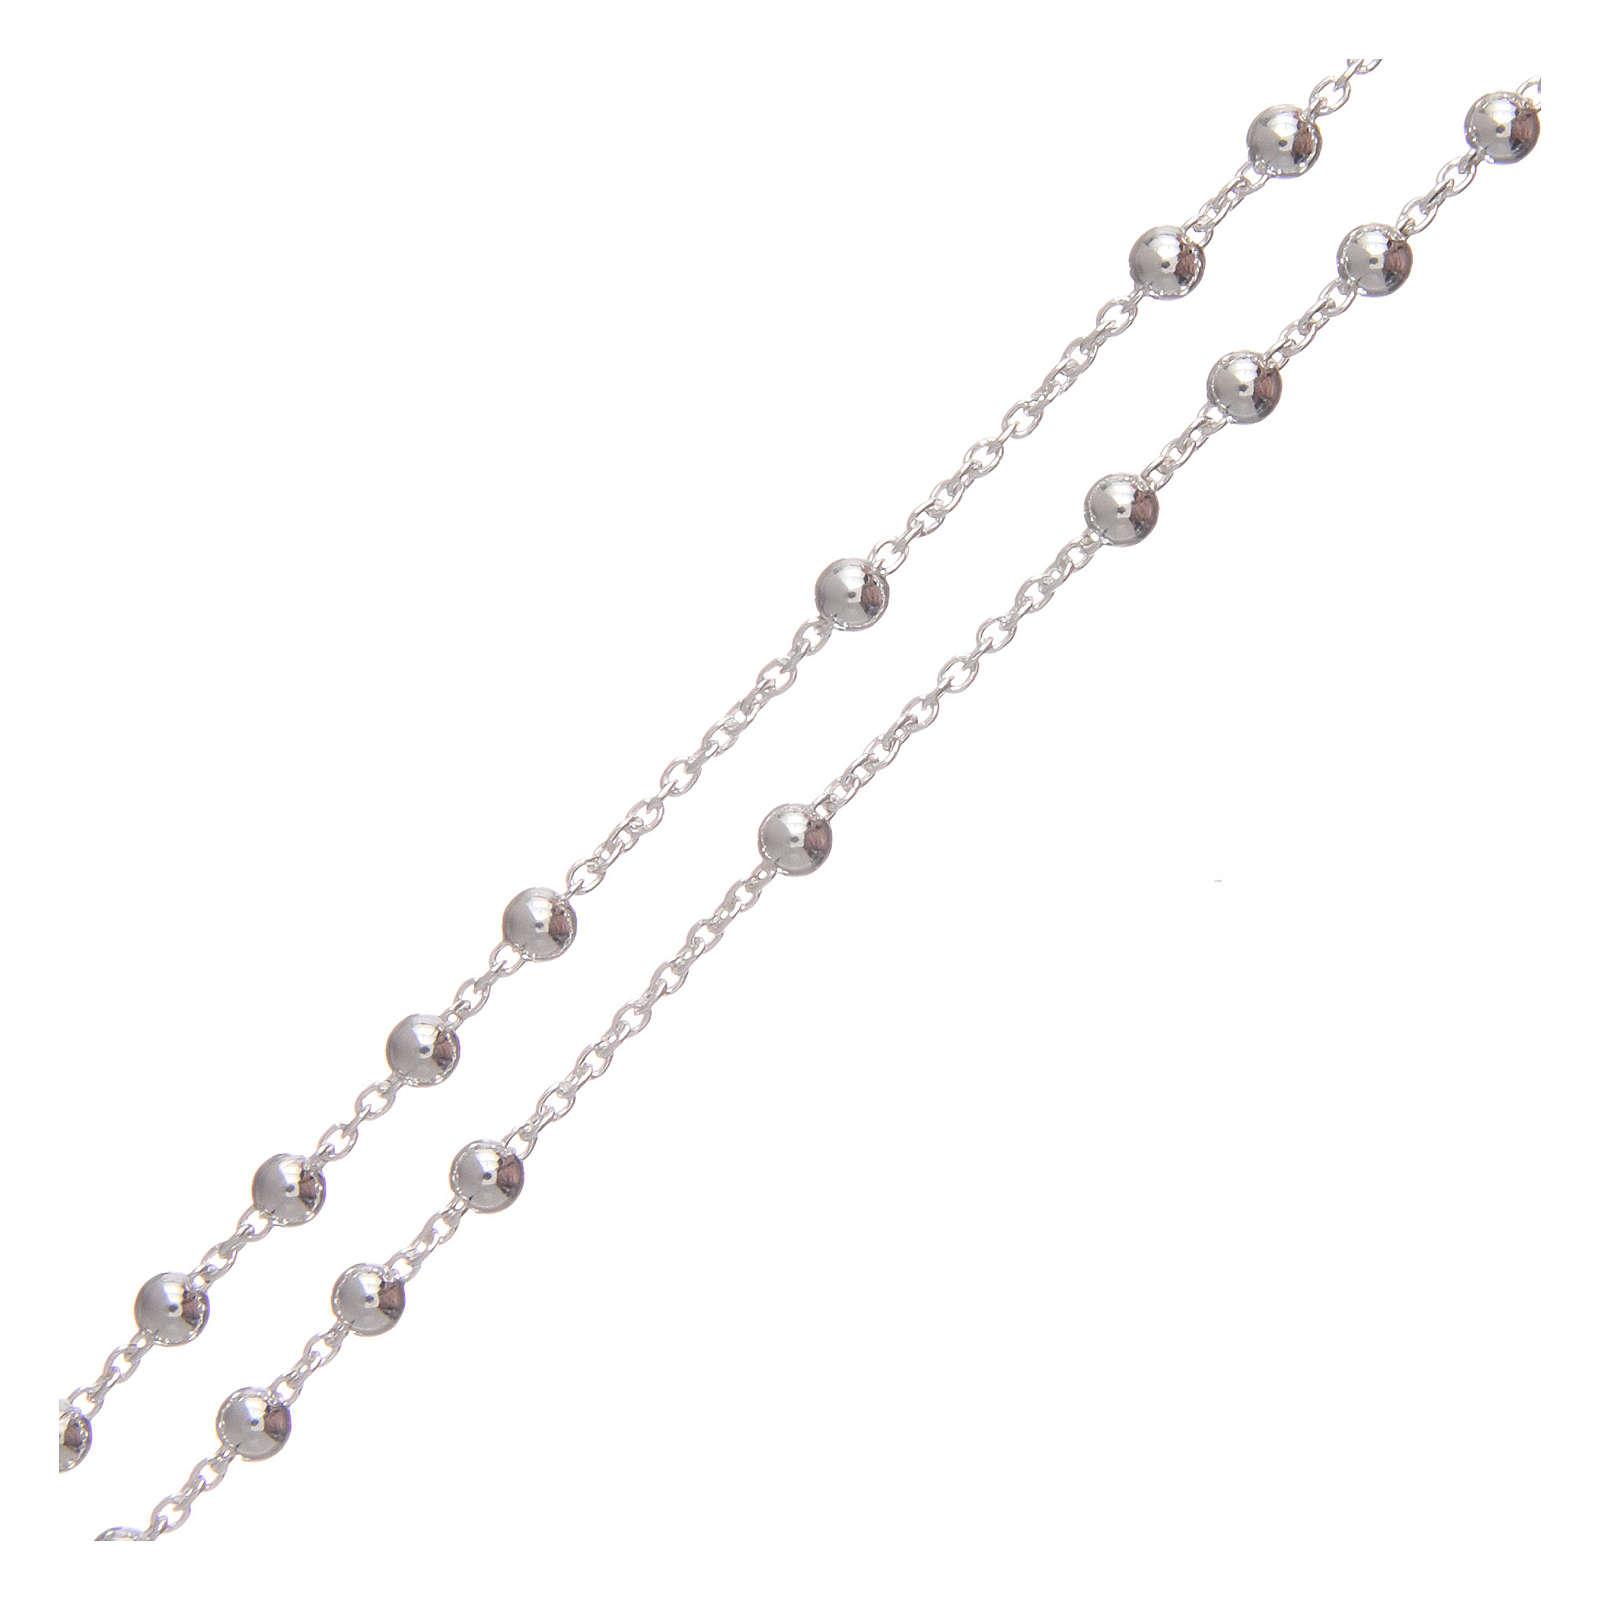 Rosario argento 925 moschettone 3 mm 4